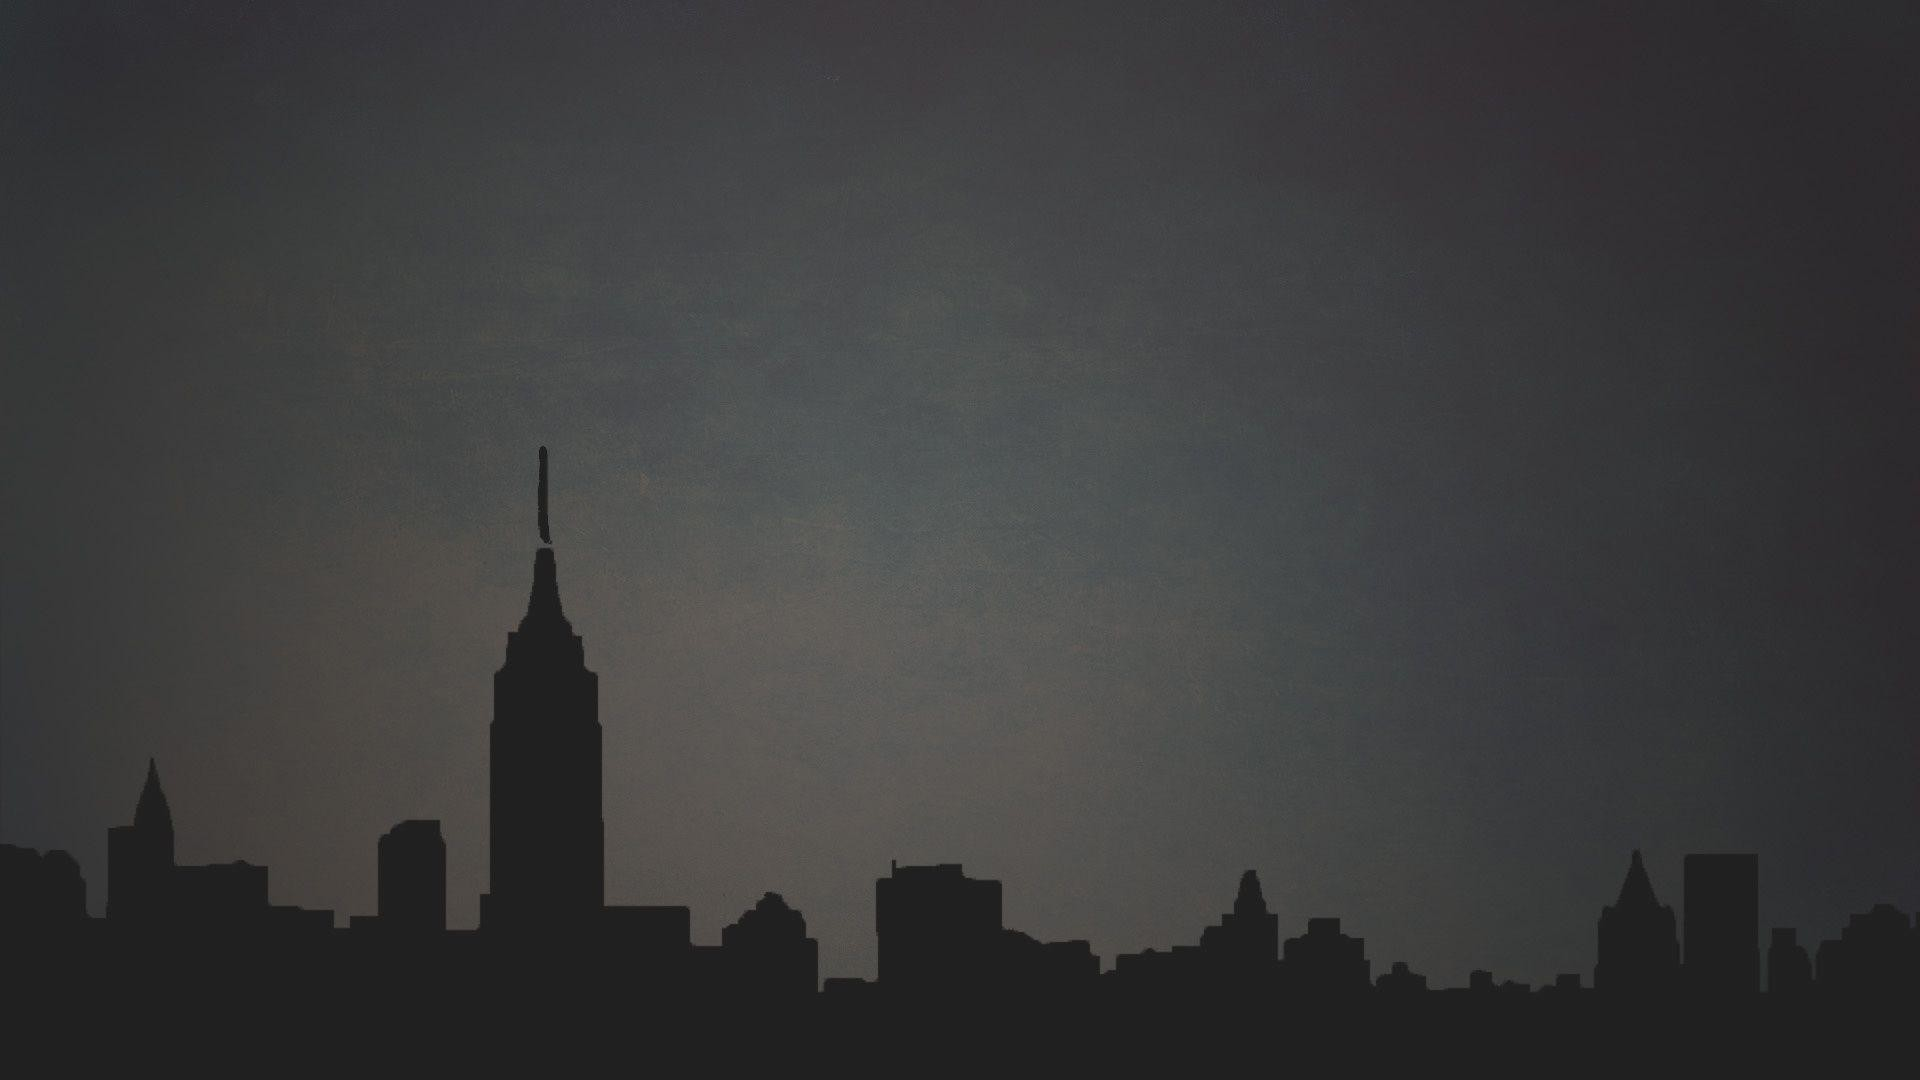 Wallpapers For Minimalist Wallpaper Dark Data Src New York Minimal Background 1920x1080 Wallpaper Teahub Io